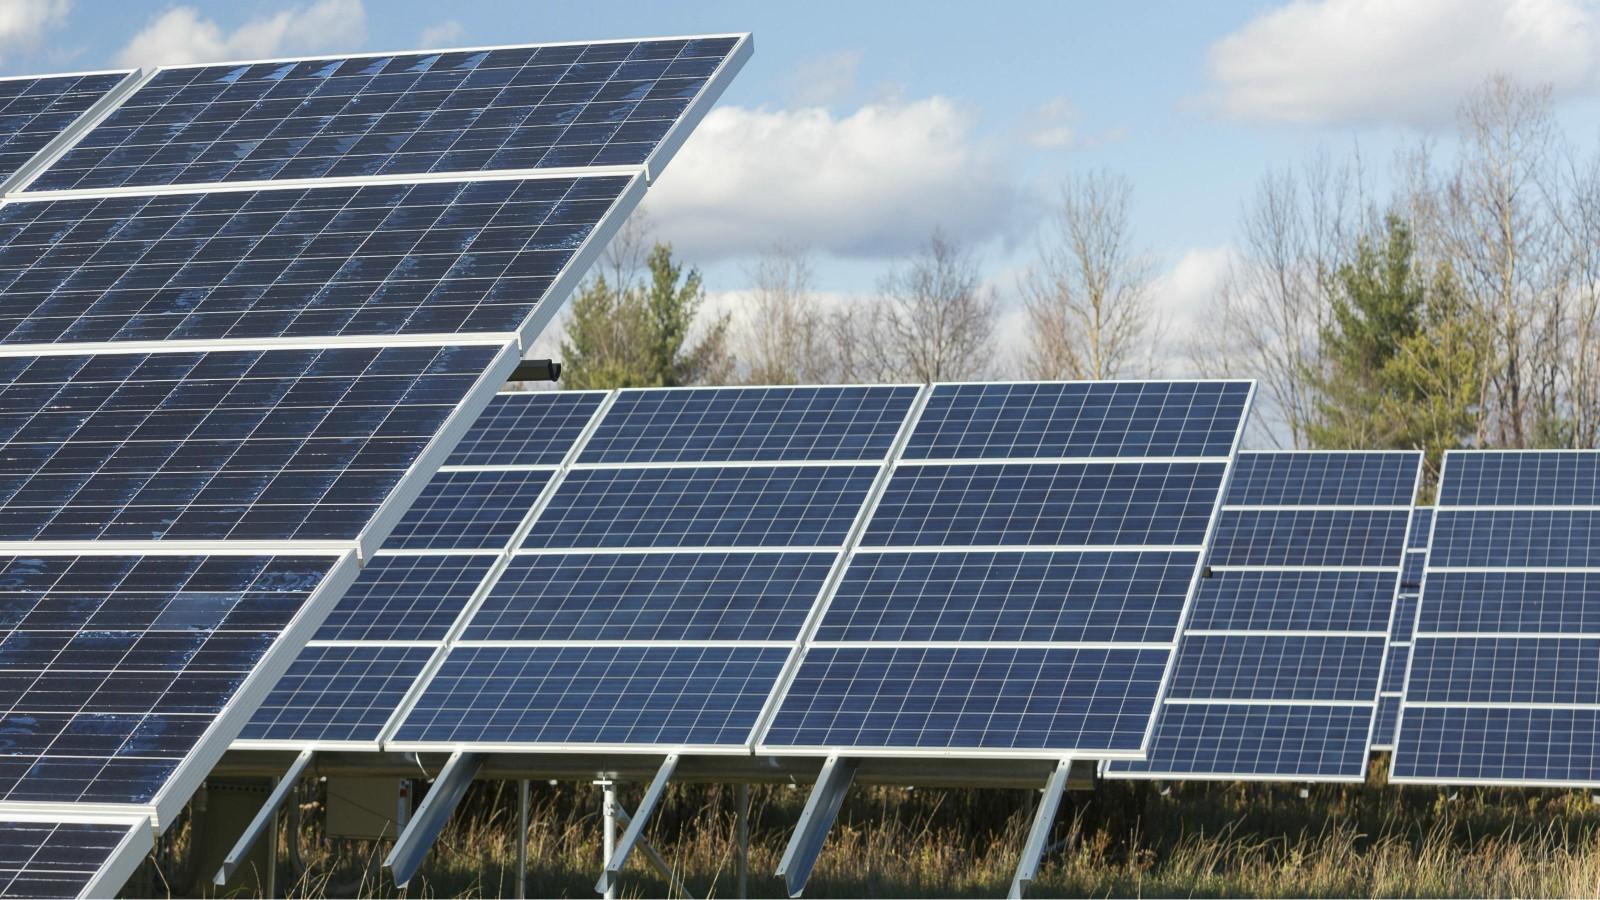 Ithaca College Begins Building 2.9 Megawatt New York Solar Array